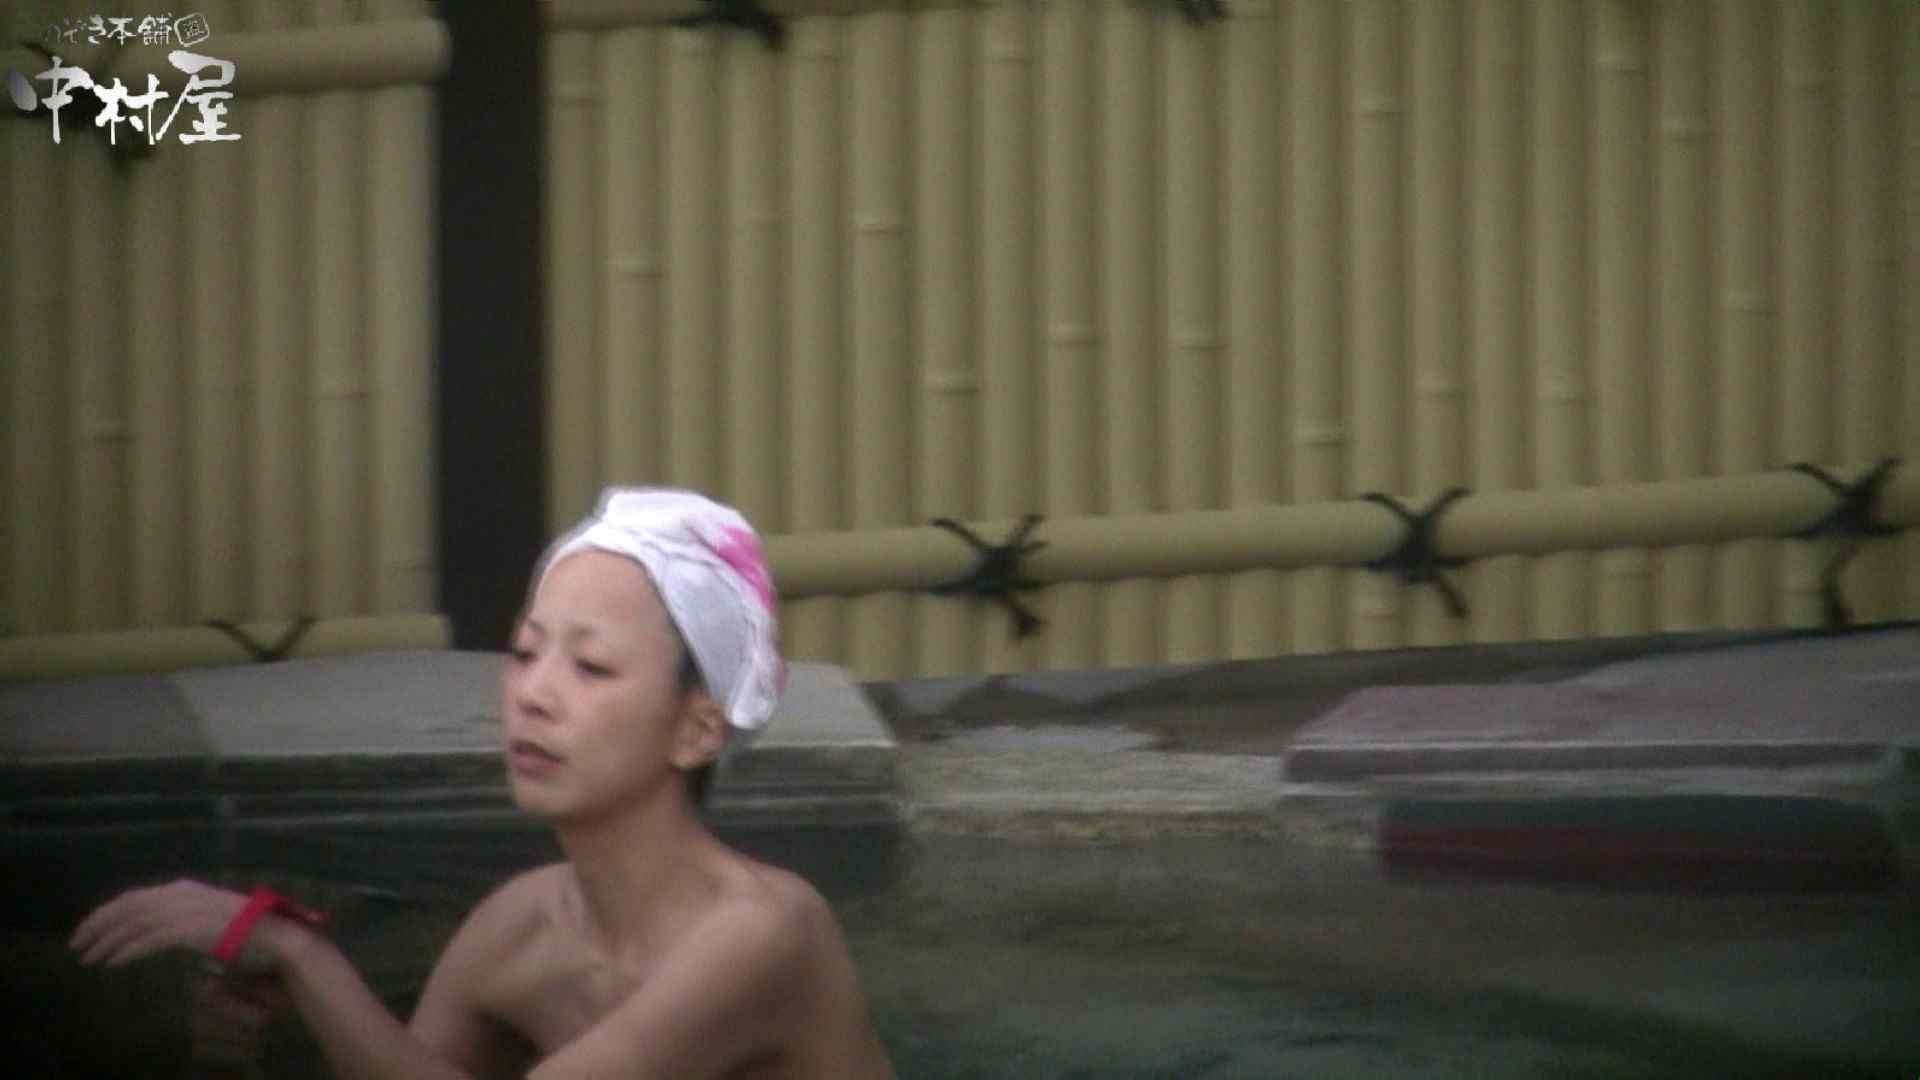 Aquaな露天風呂Vol.929 盗撮シリーズ   露天風呂編  94PIX 23